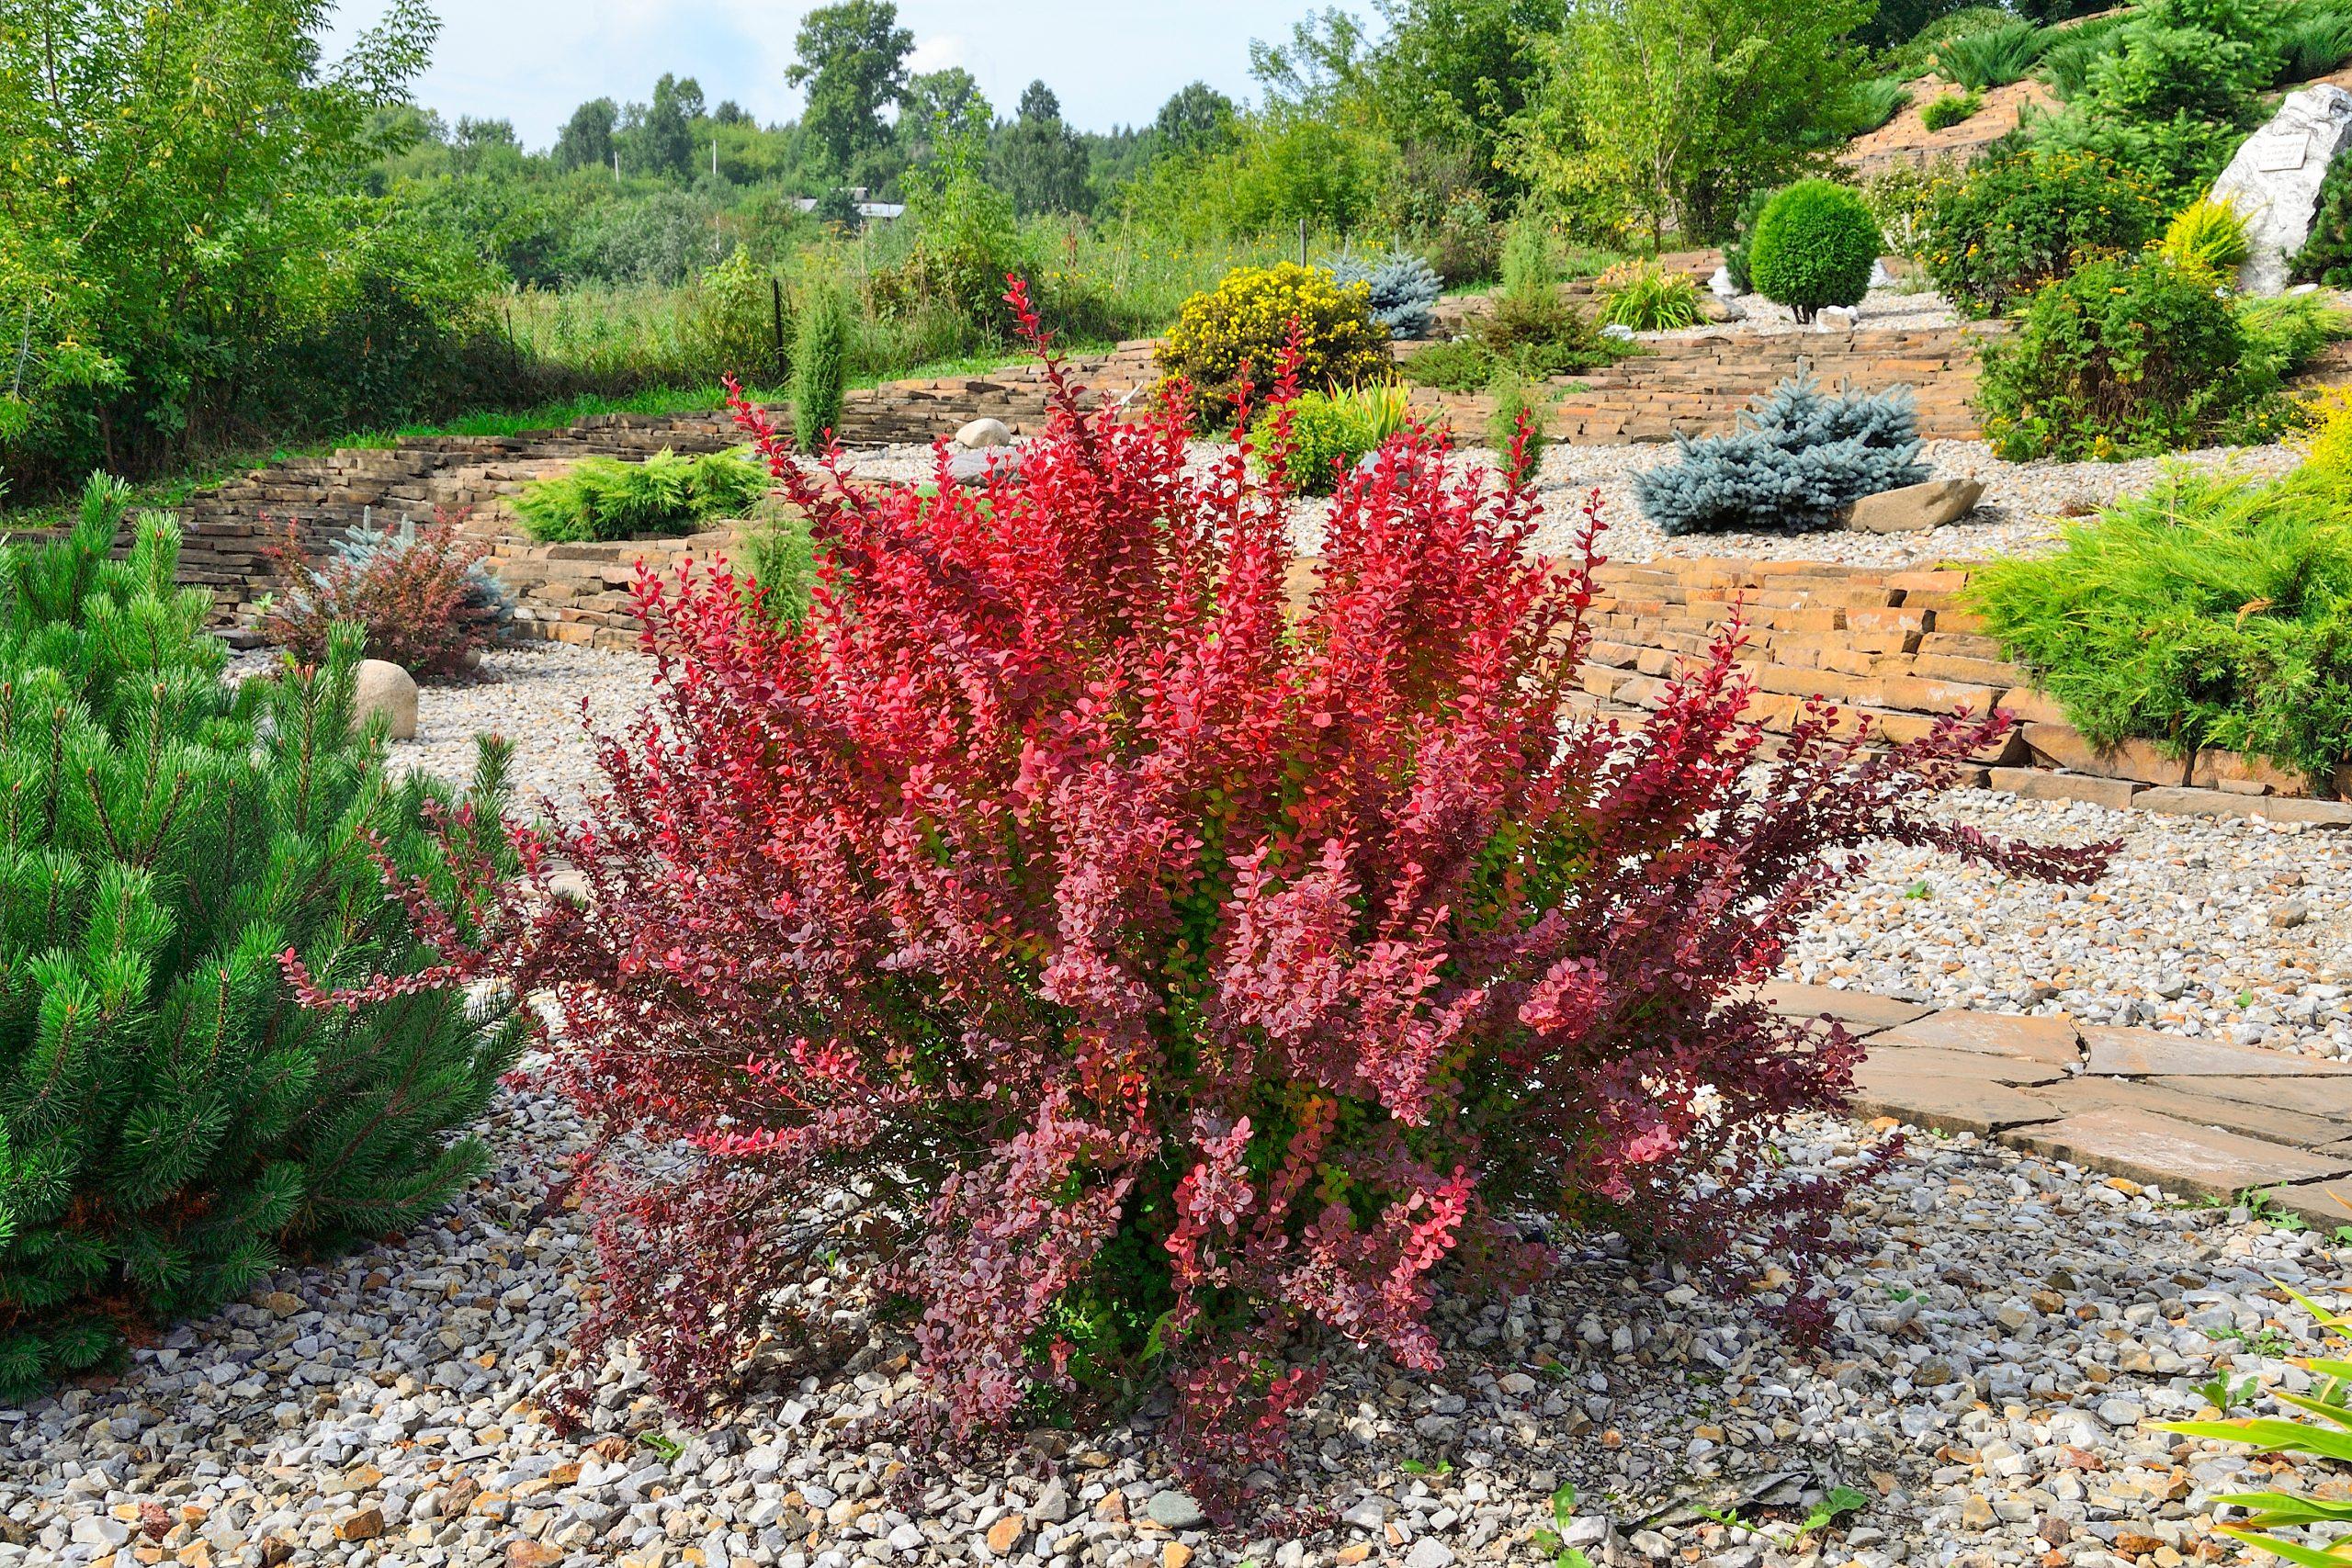 "Cultivar,Thunbergs,Barberry,(berberis,Thunbergii,""red,Rocket""),In,Rocky,Garden."